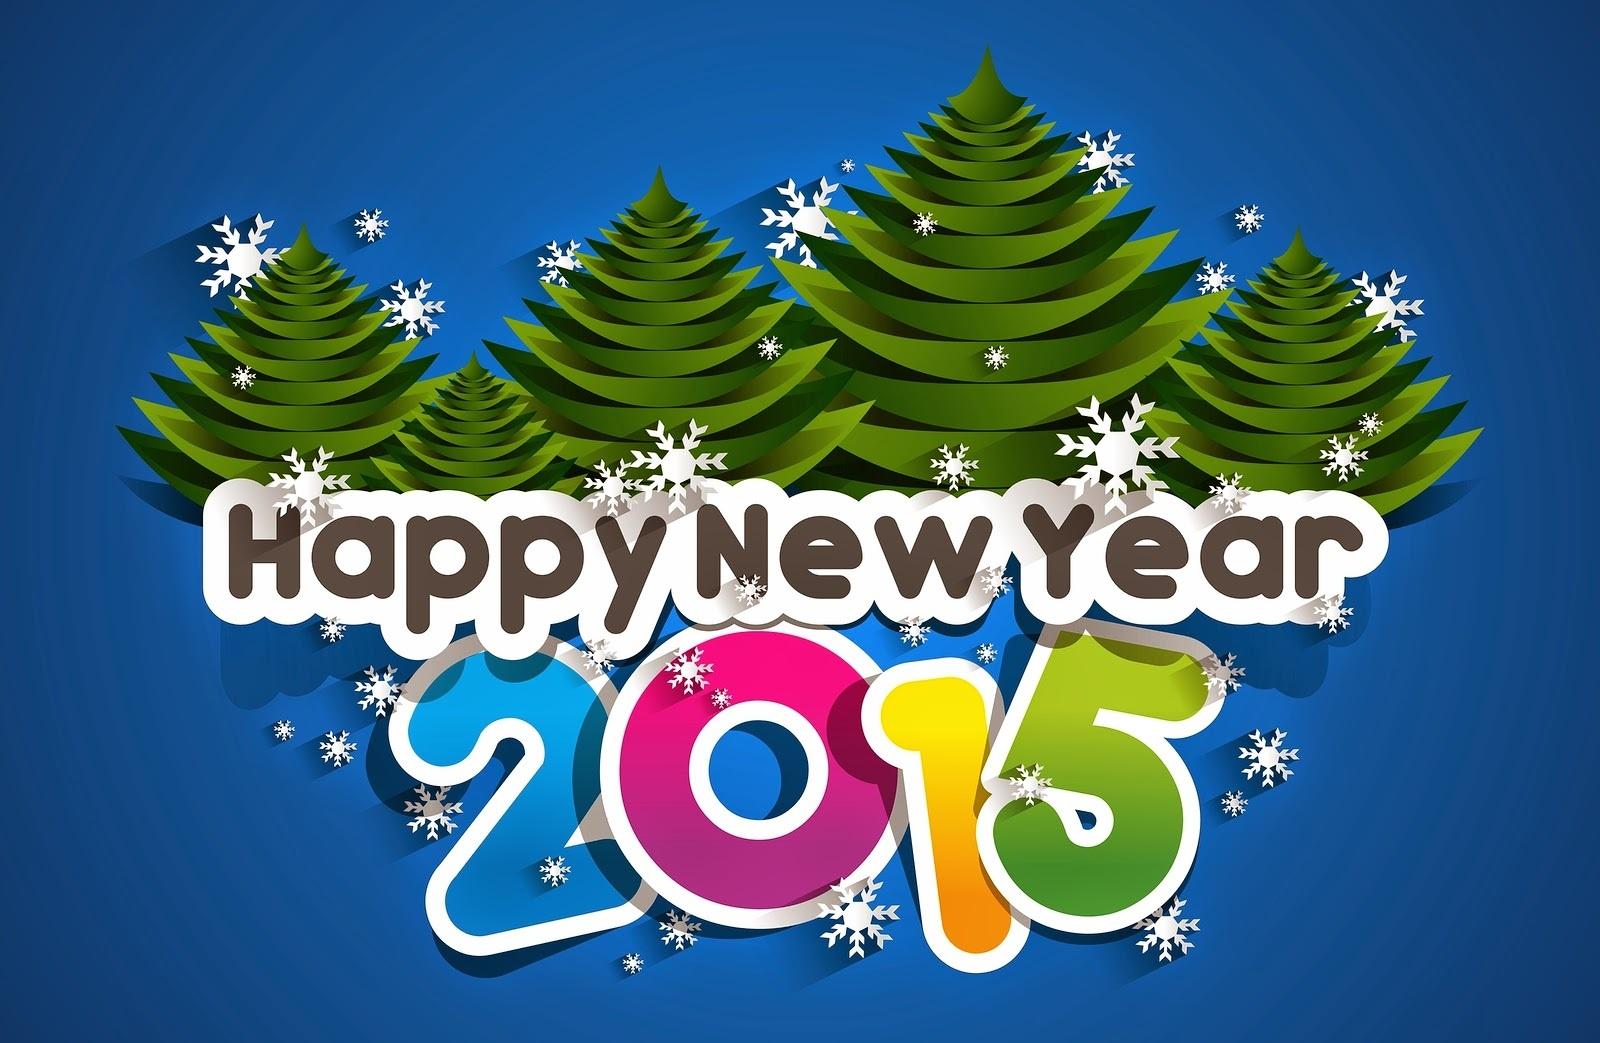 new year 2015 desktop wallpaper 1600x1043